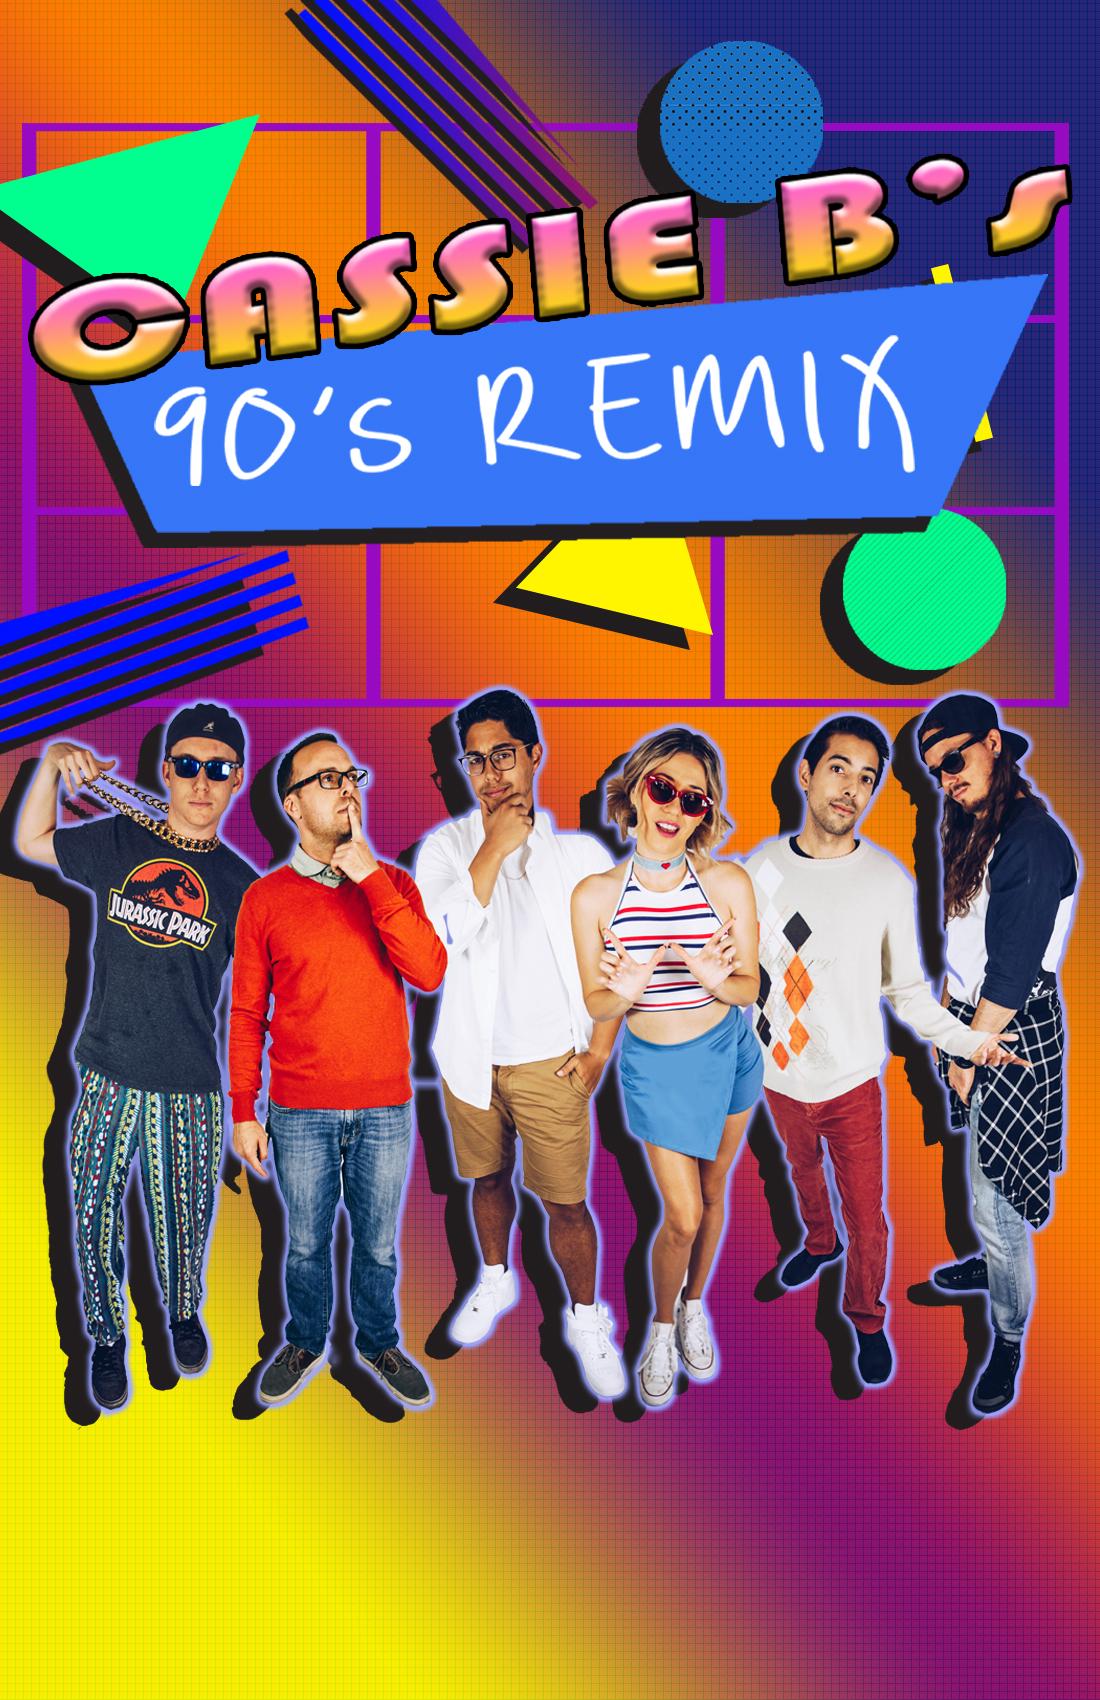 90s-remix-7x11